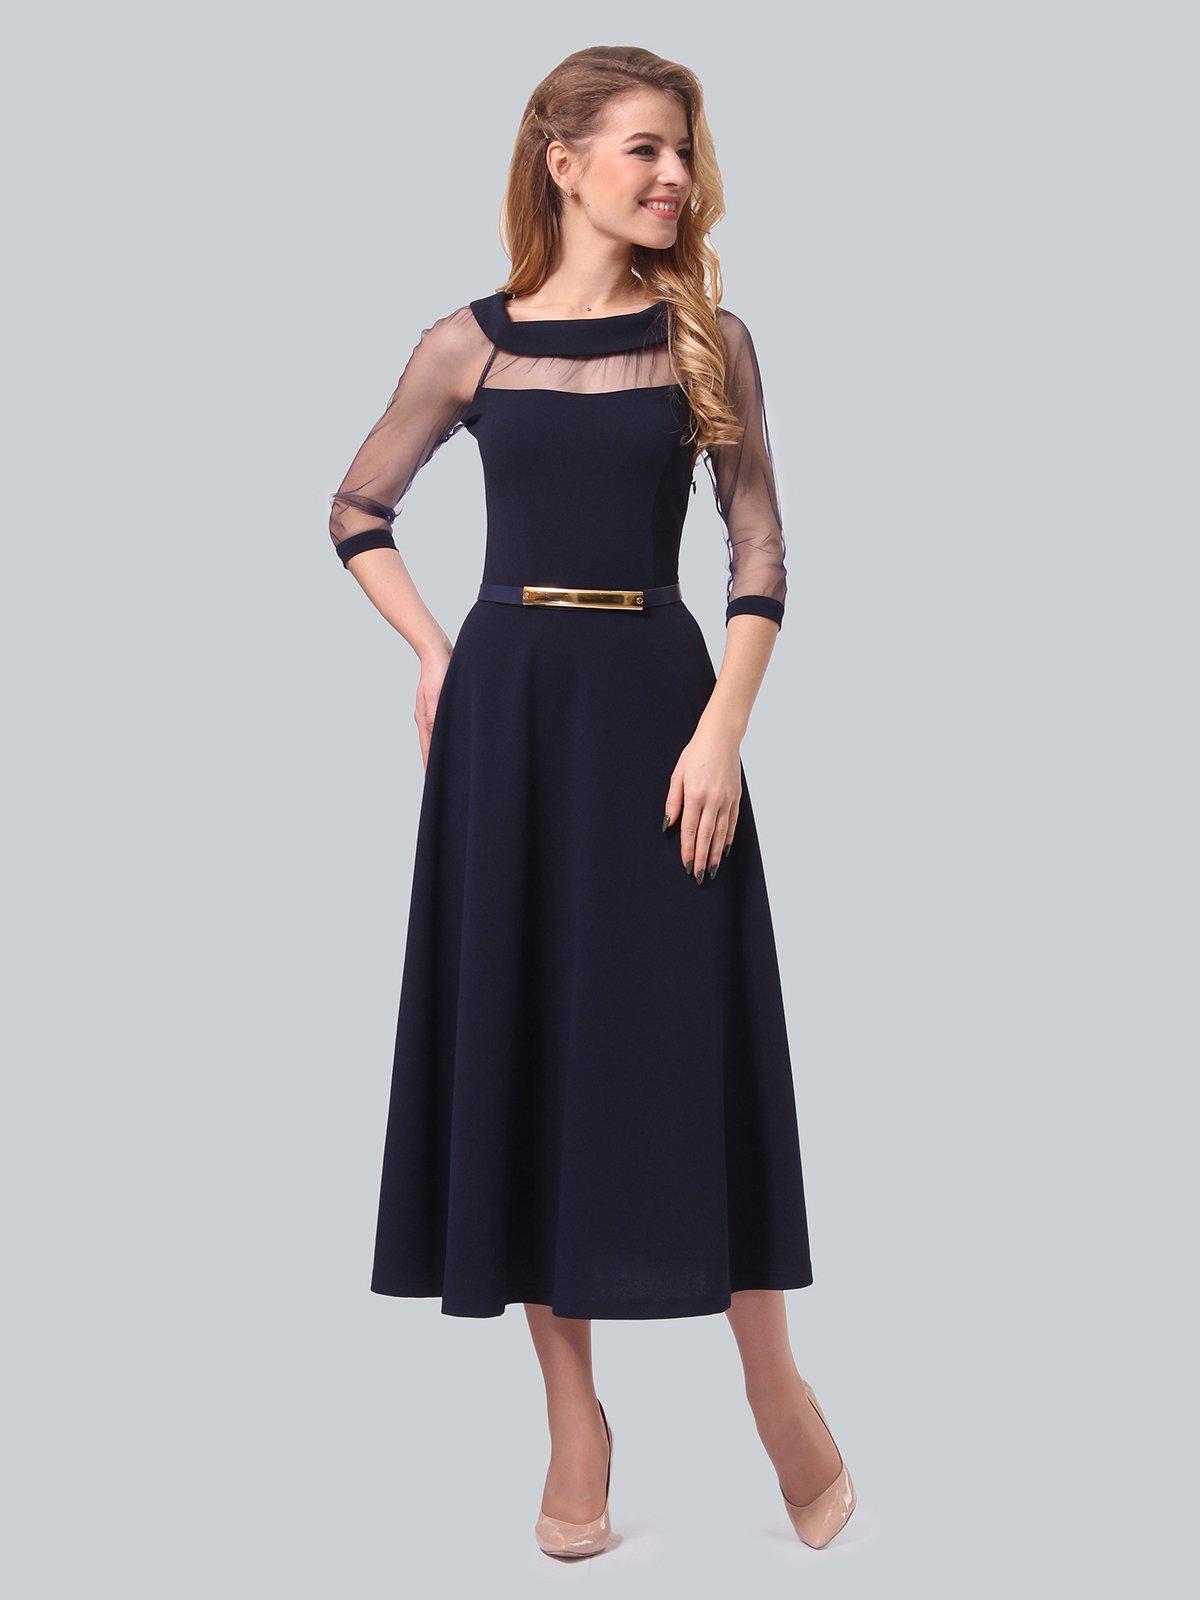 Платье темно-синее | 3879718 | фото 2